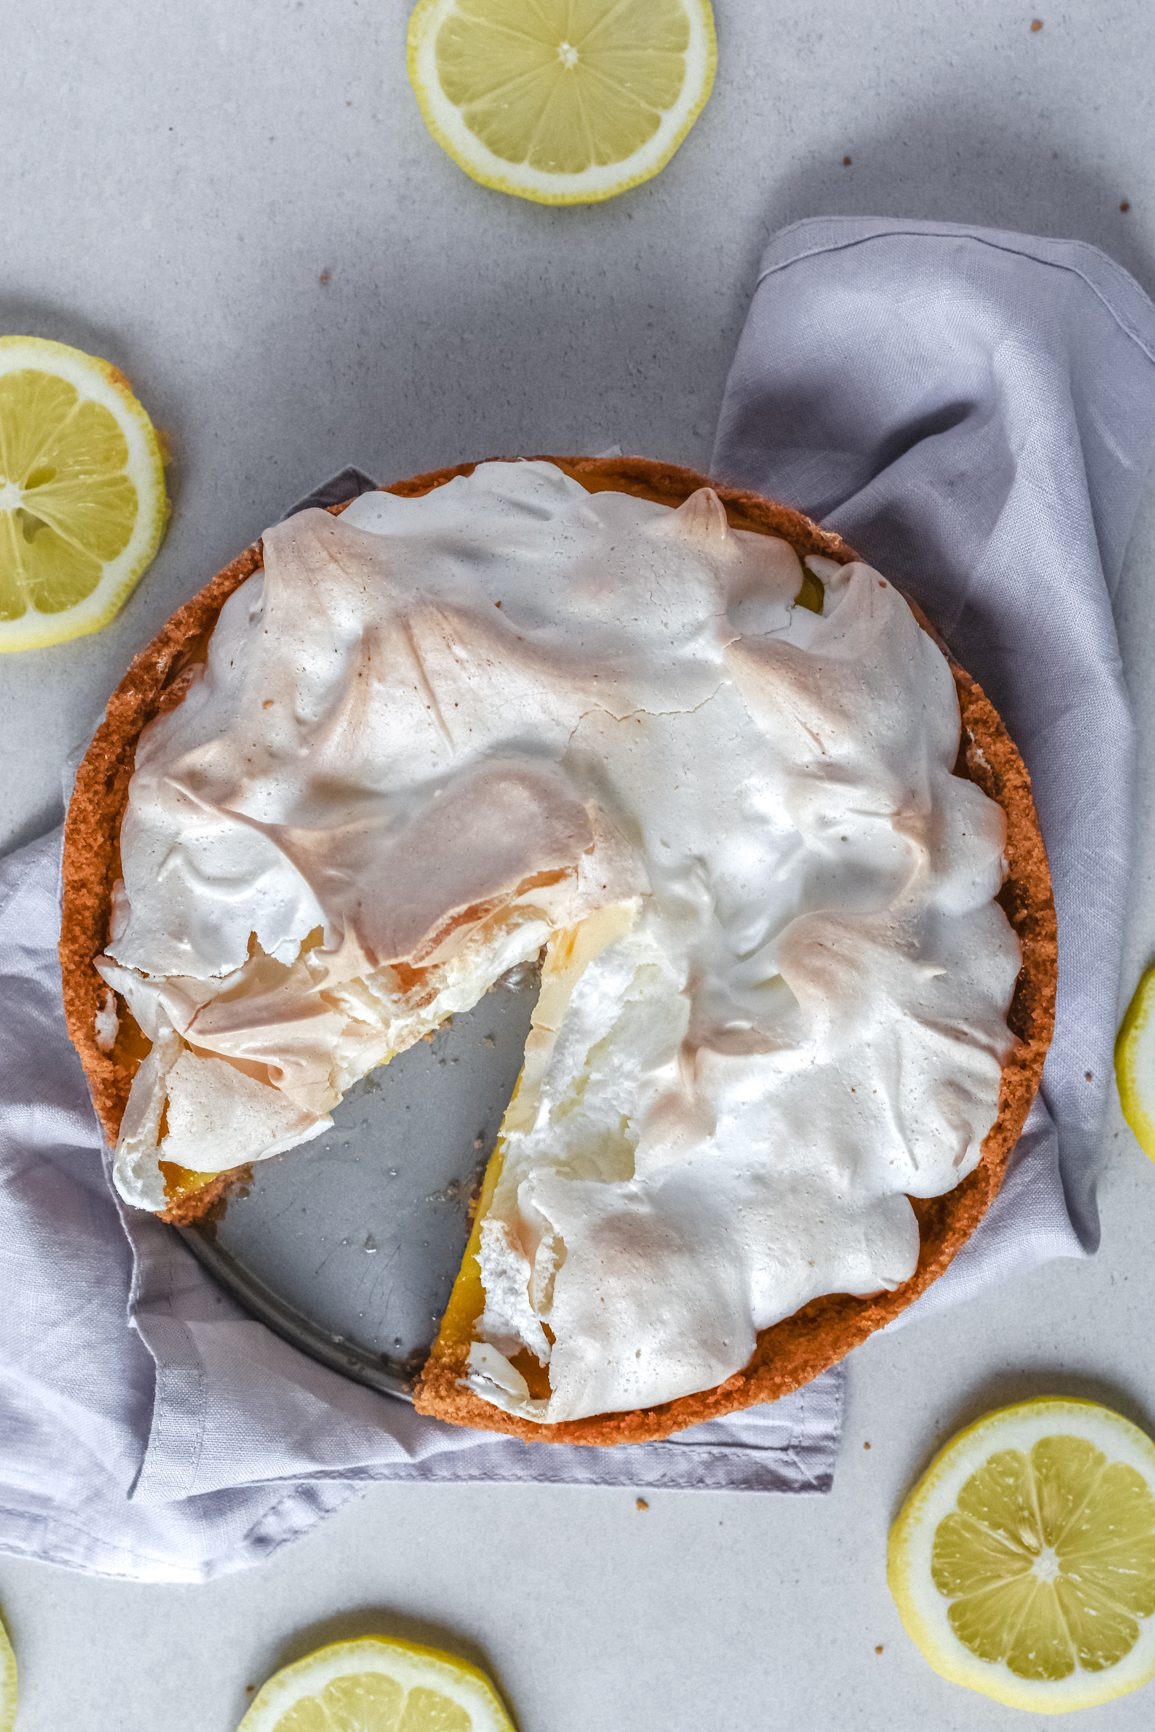 Ina Paarman's Epic Lemon Meringue made Gluten-Free 3